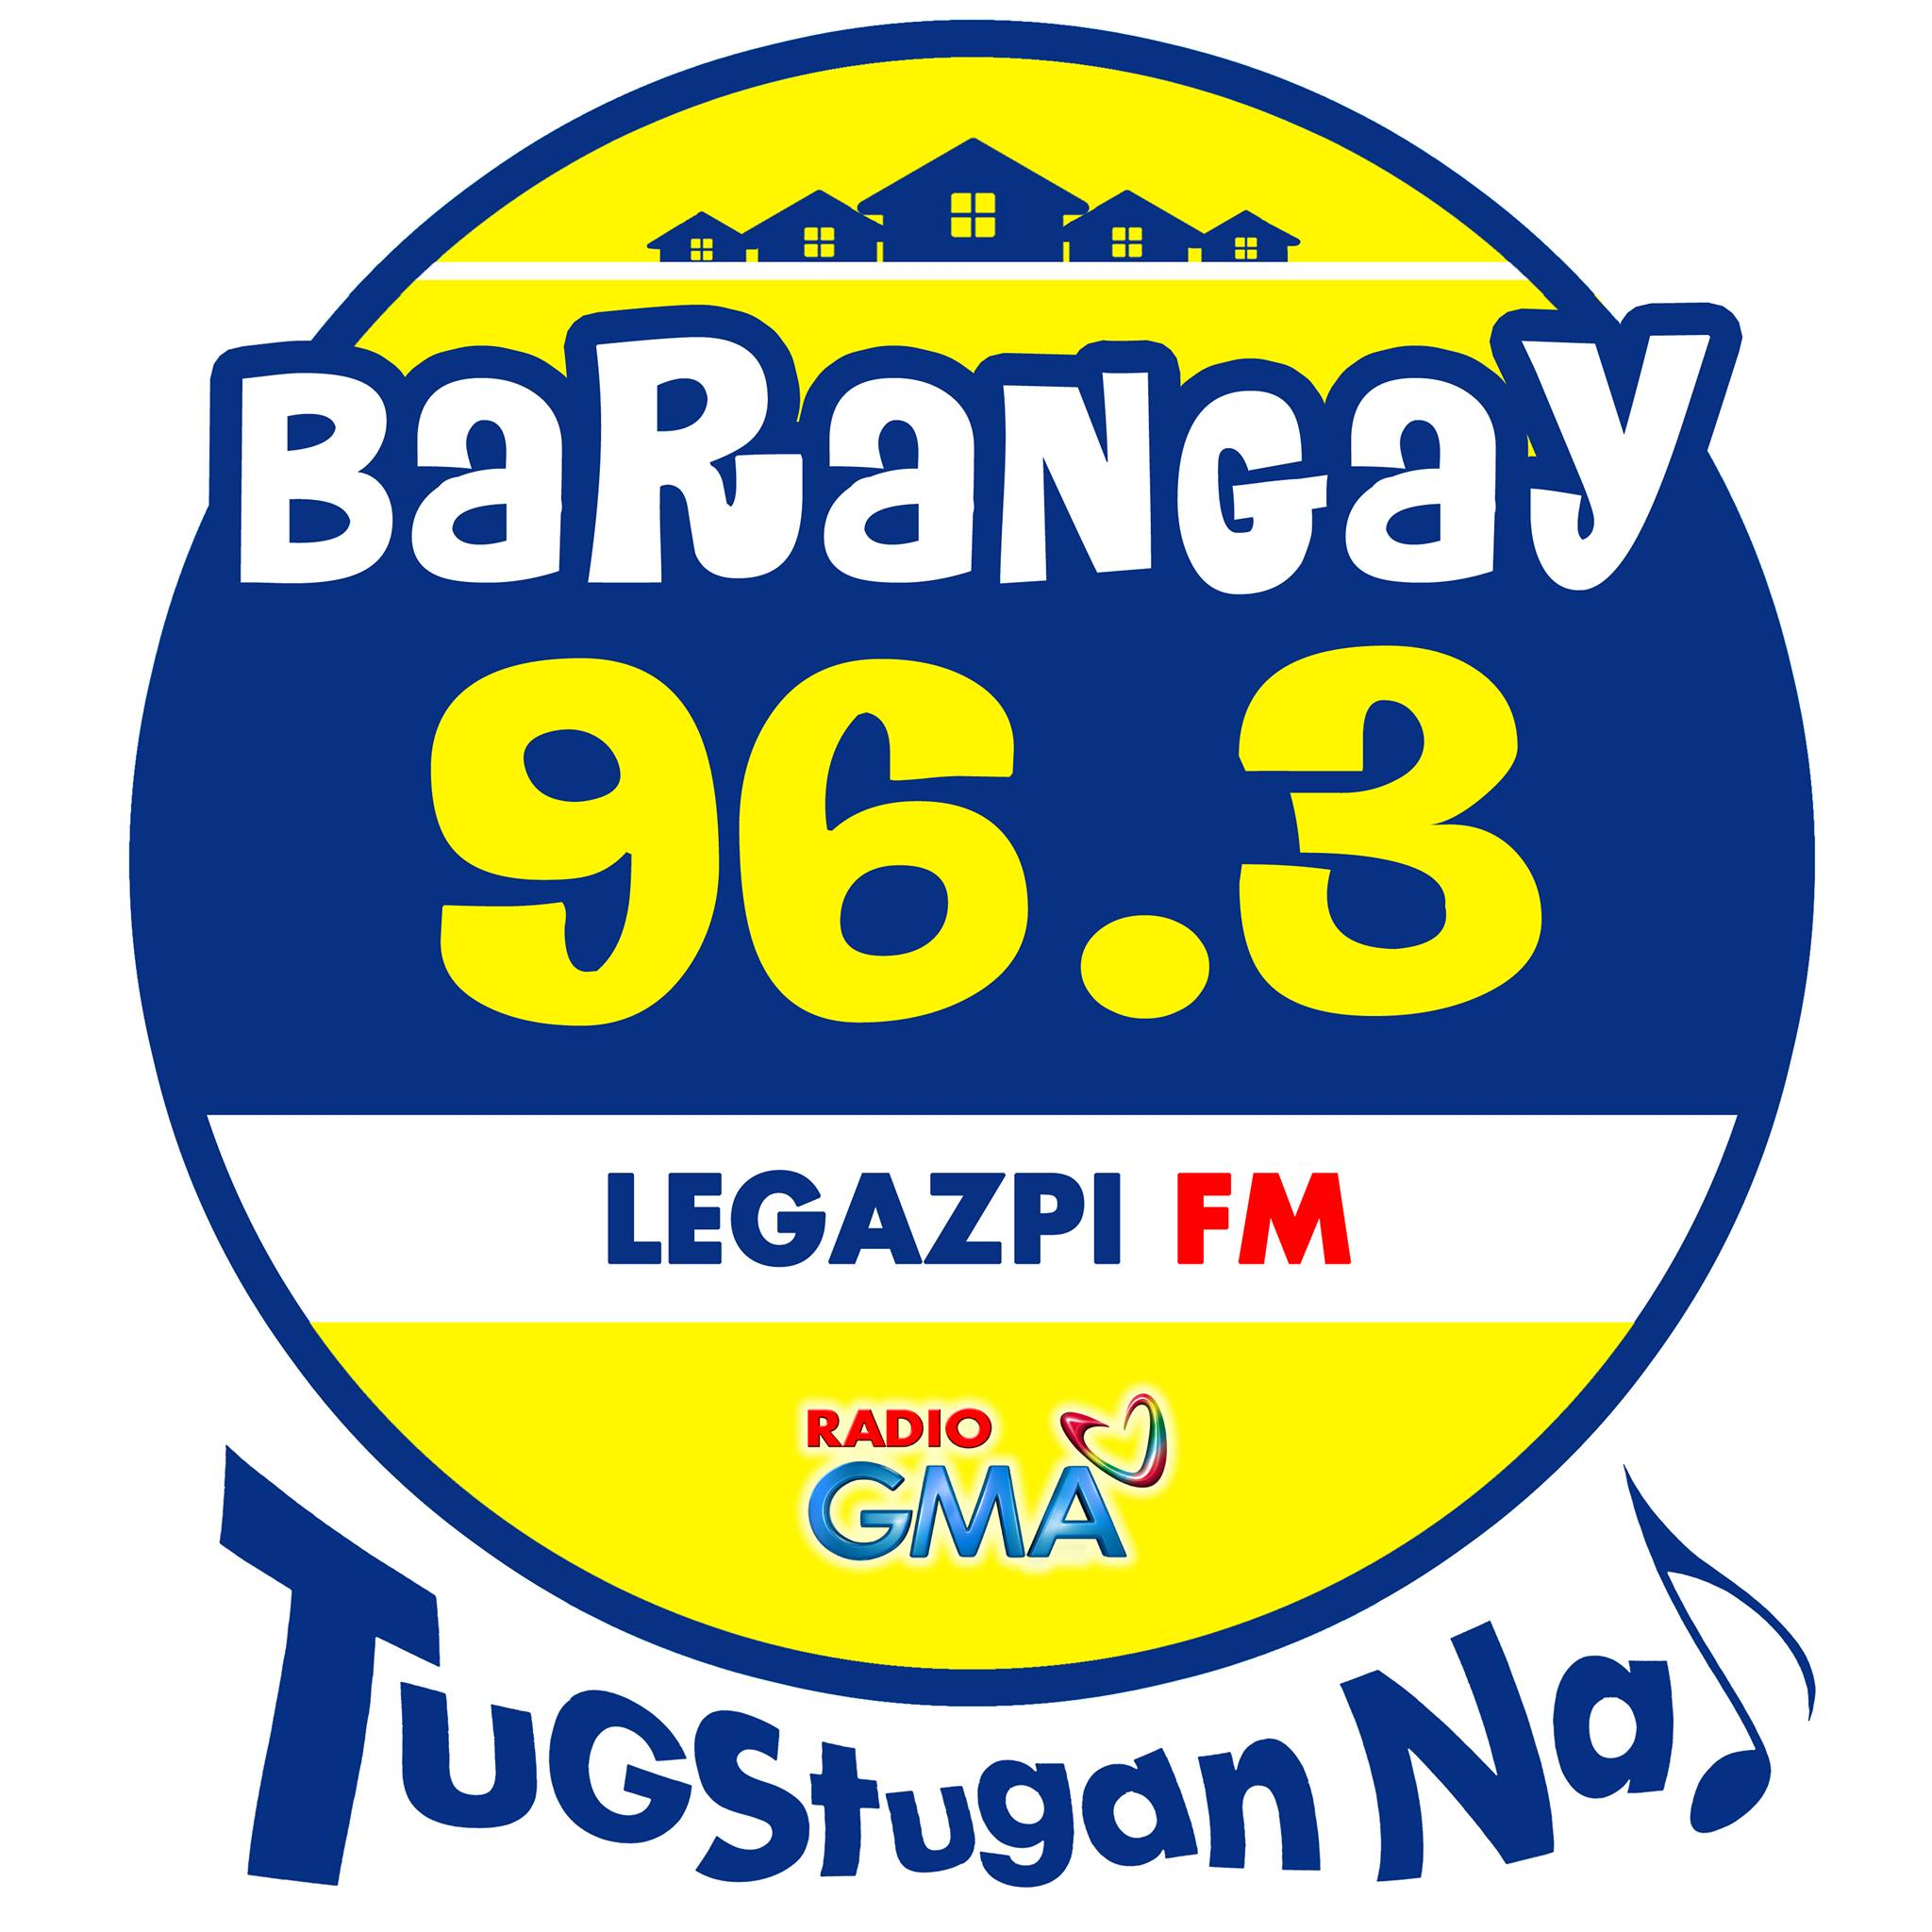 Barangay 963 Legazpi 2015logo.jpeg